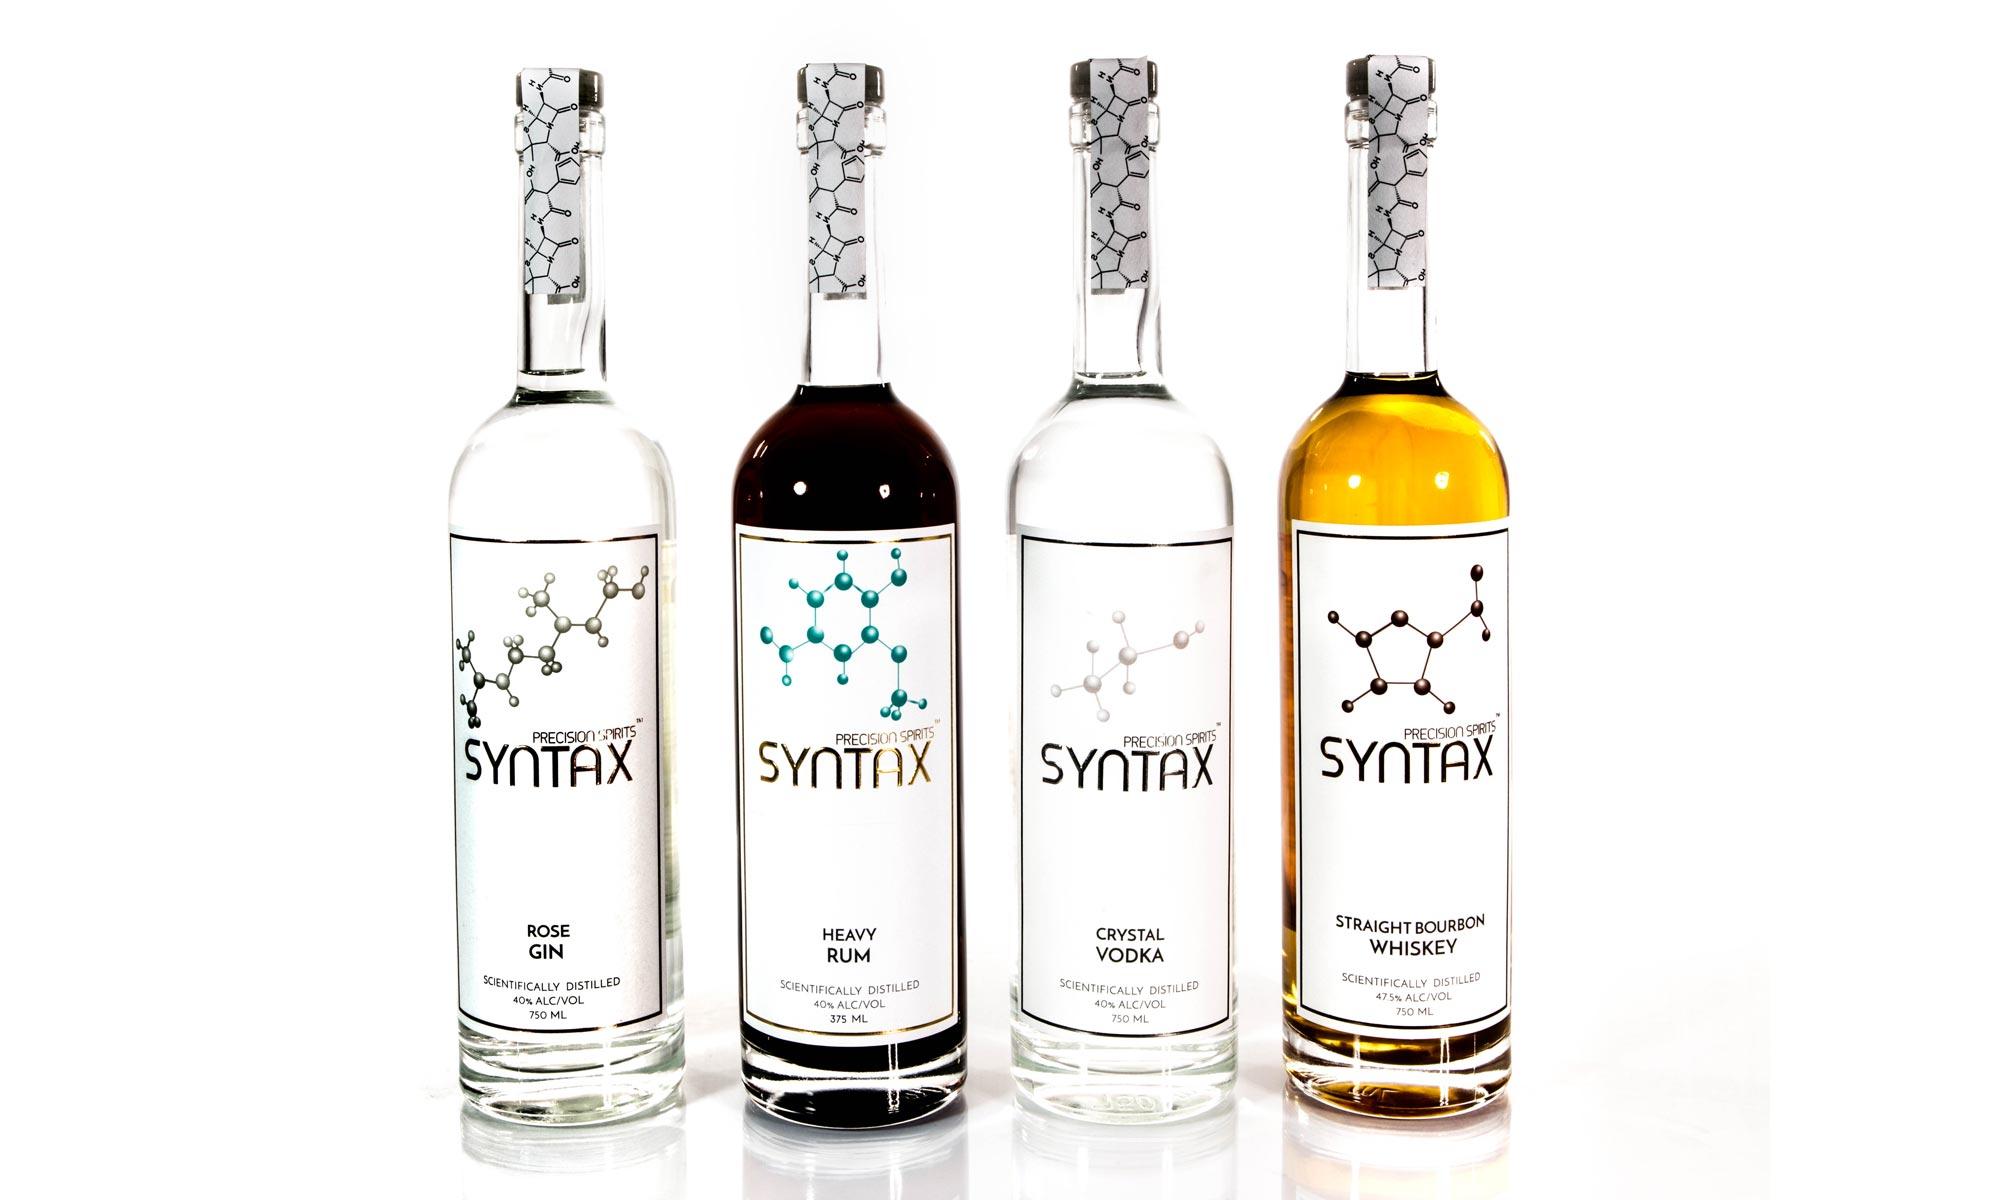 Syntax Spirits